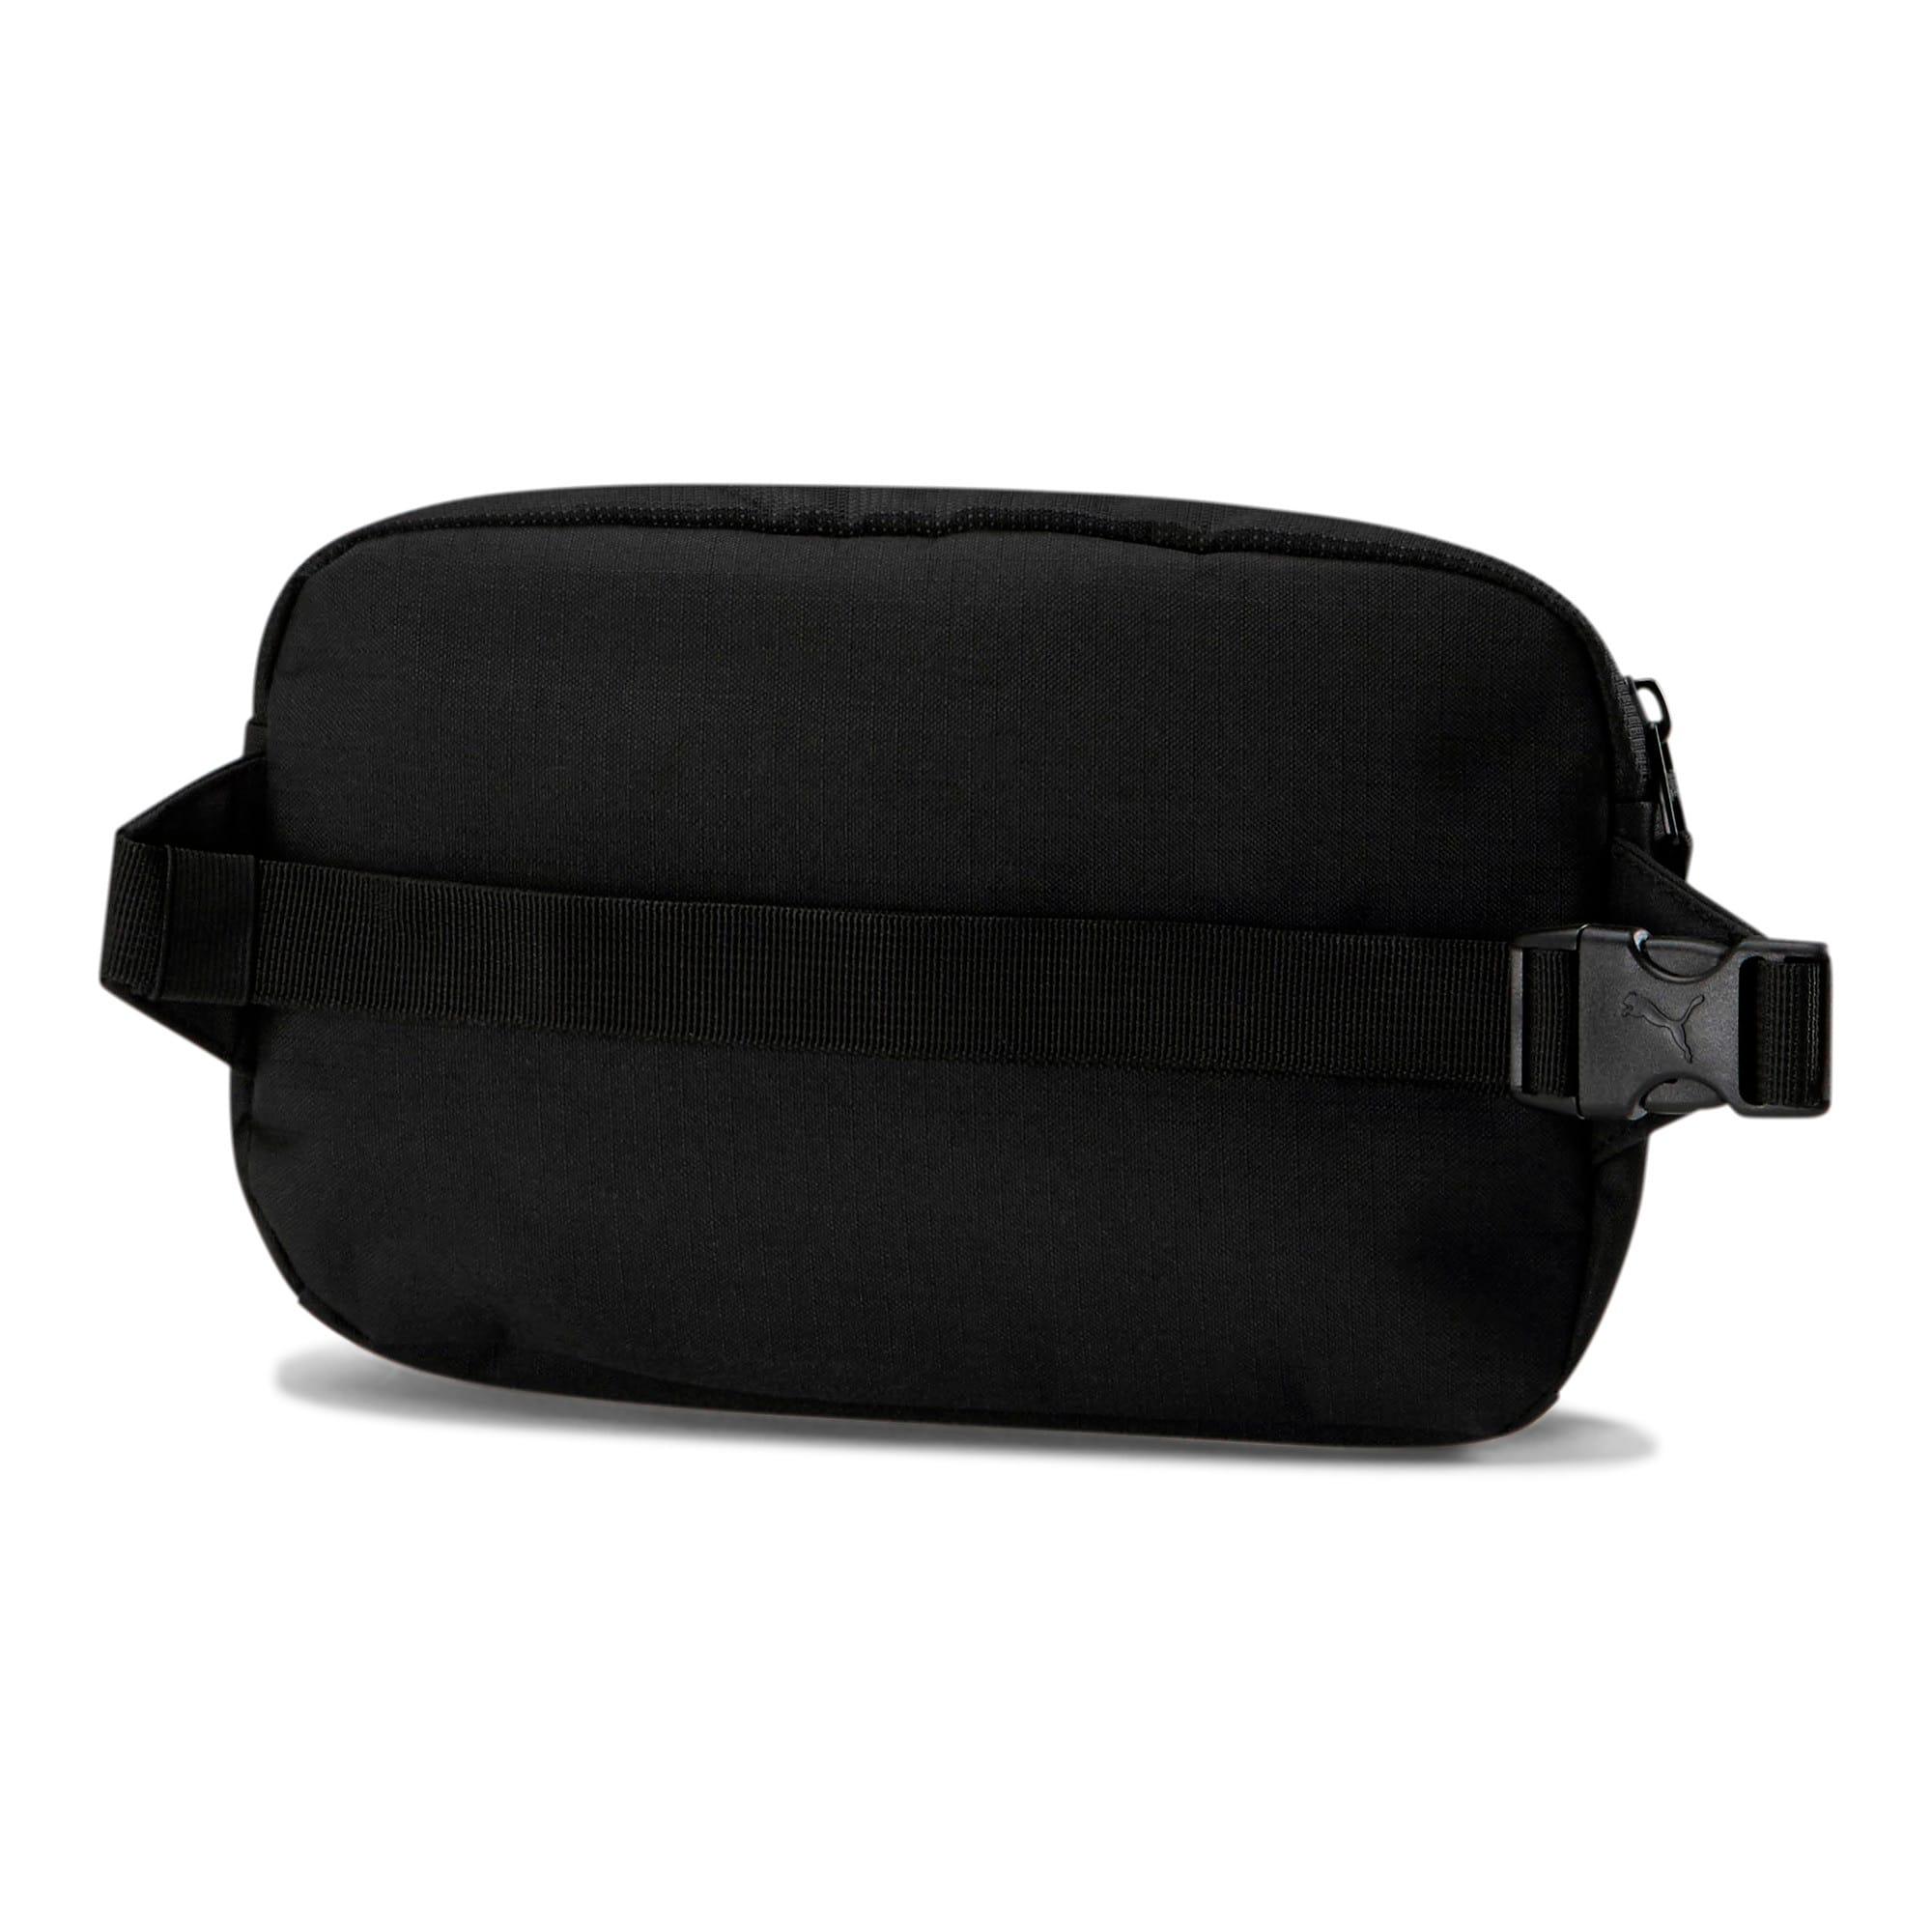 Thumbnail 2 of Formation Waist Bag, Black, medium